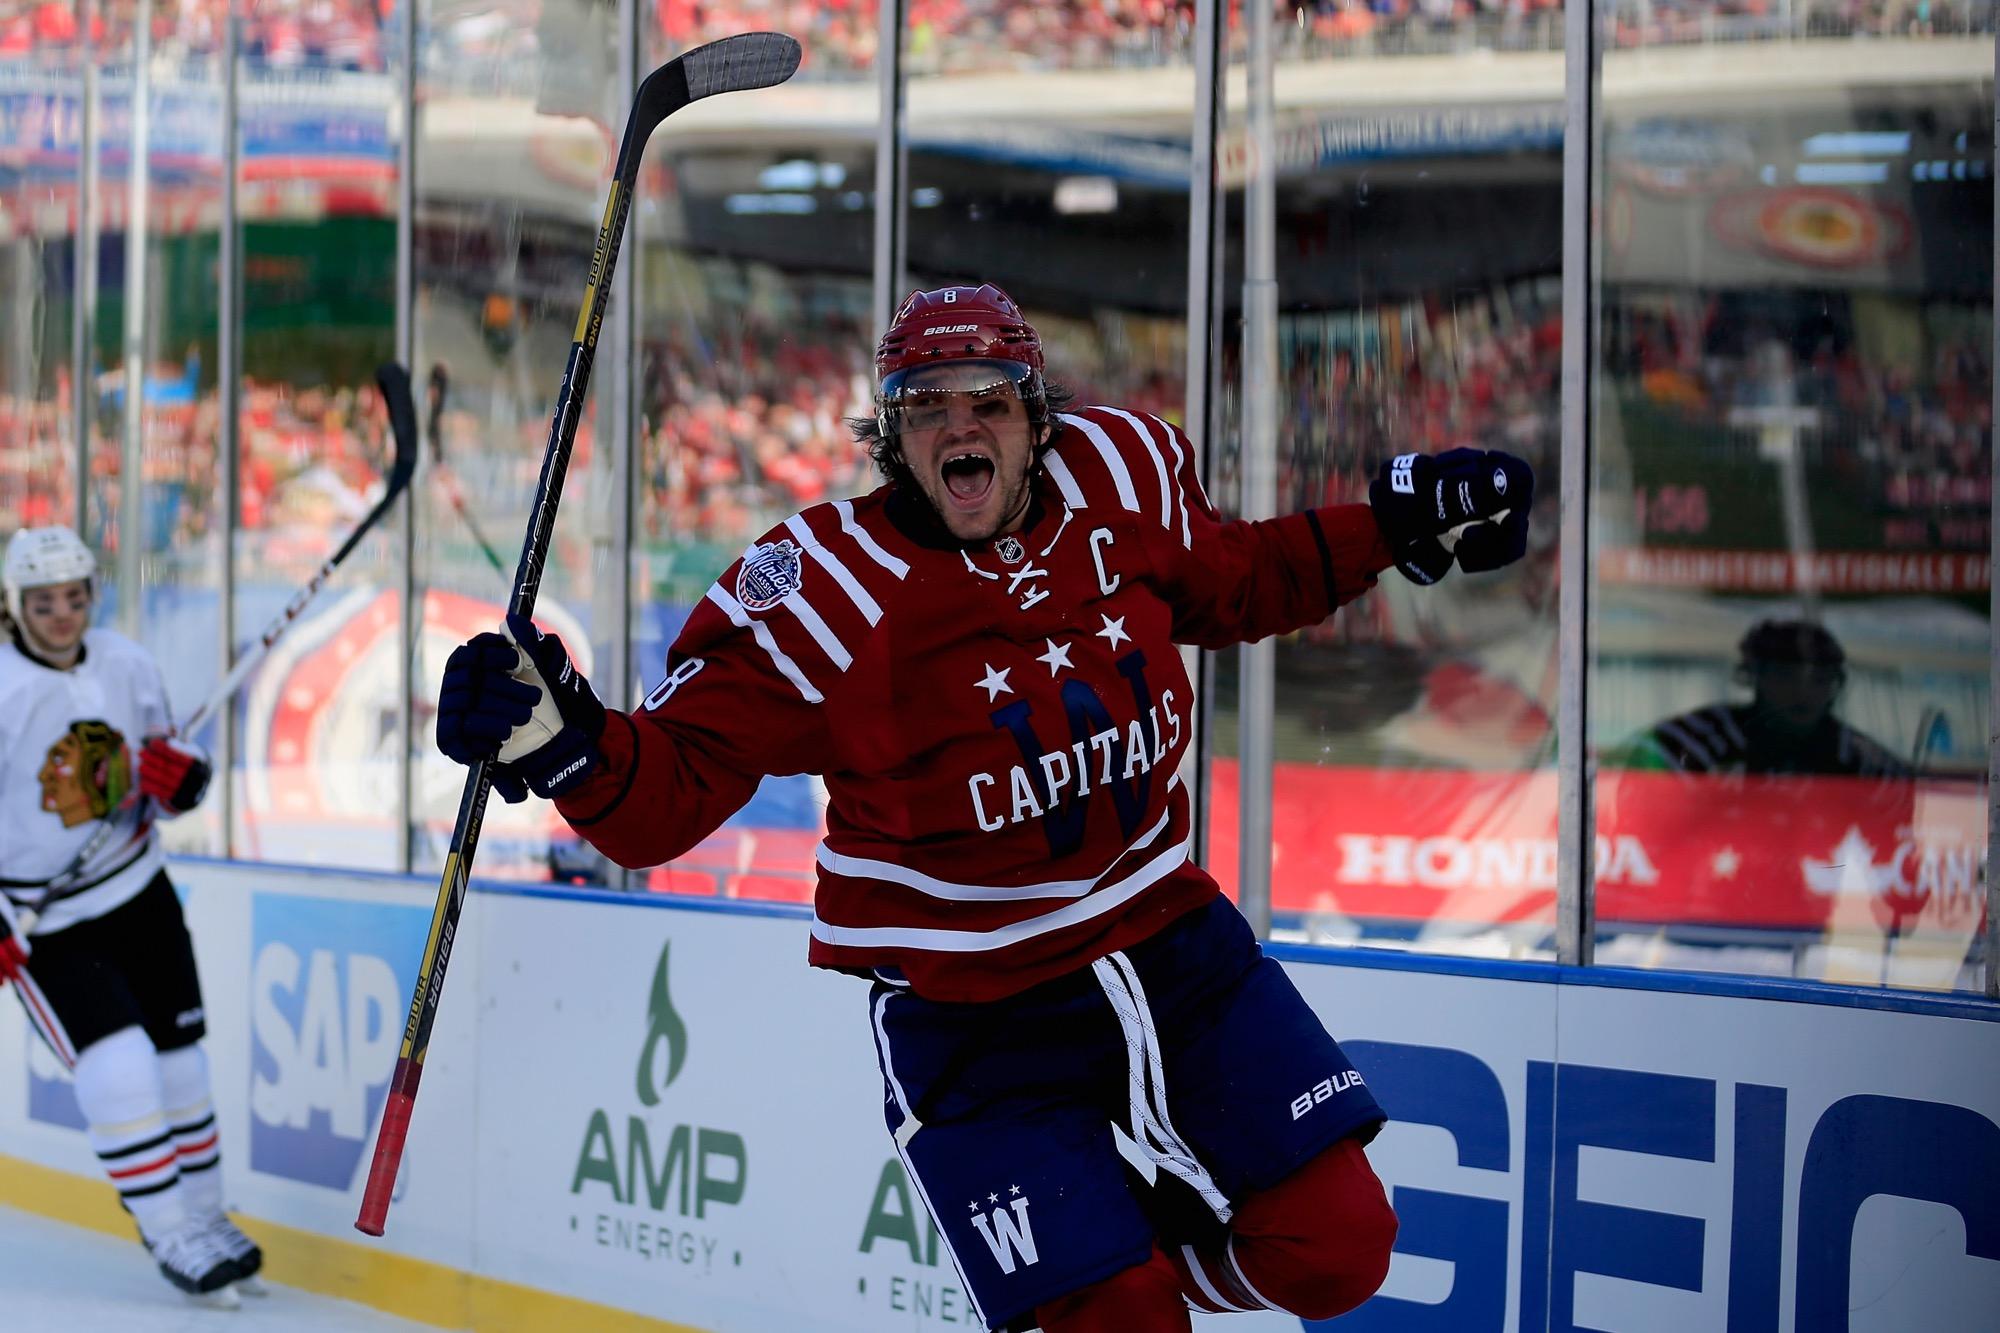 a357a21615d86e WASHINGTON, DC - JANUARY 01: Alex Ovechkin #8 of the Washington Capitals  celebrates